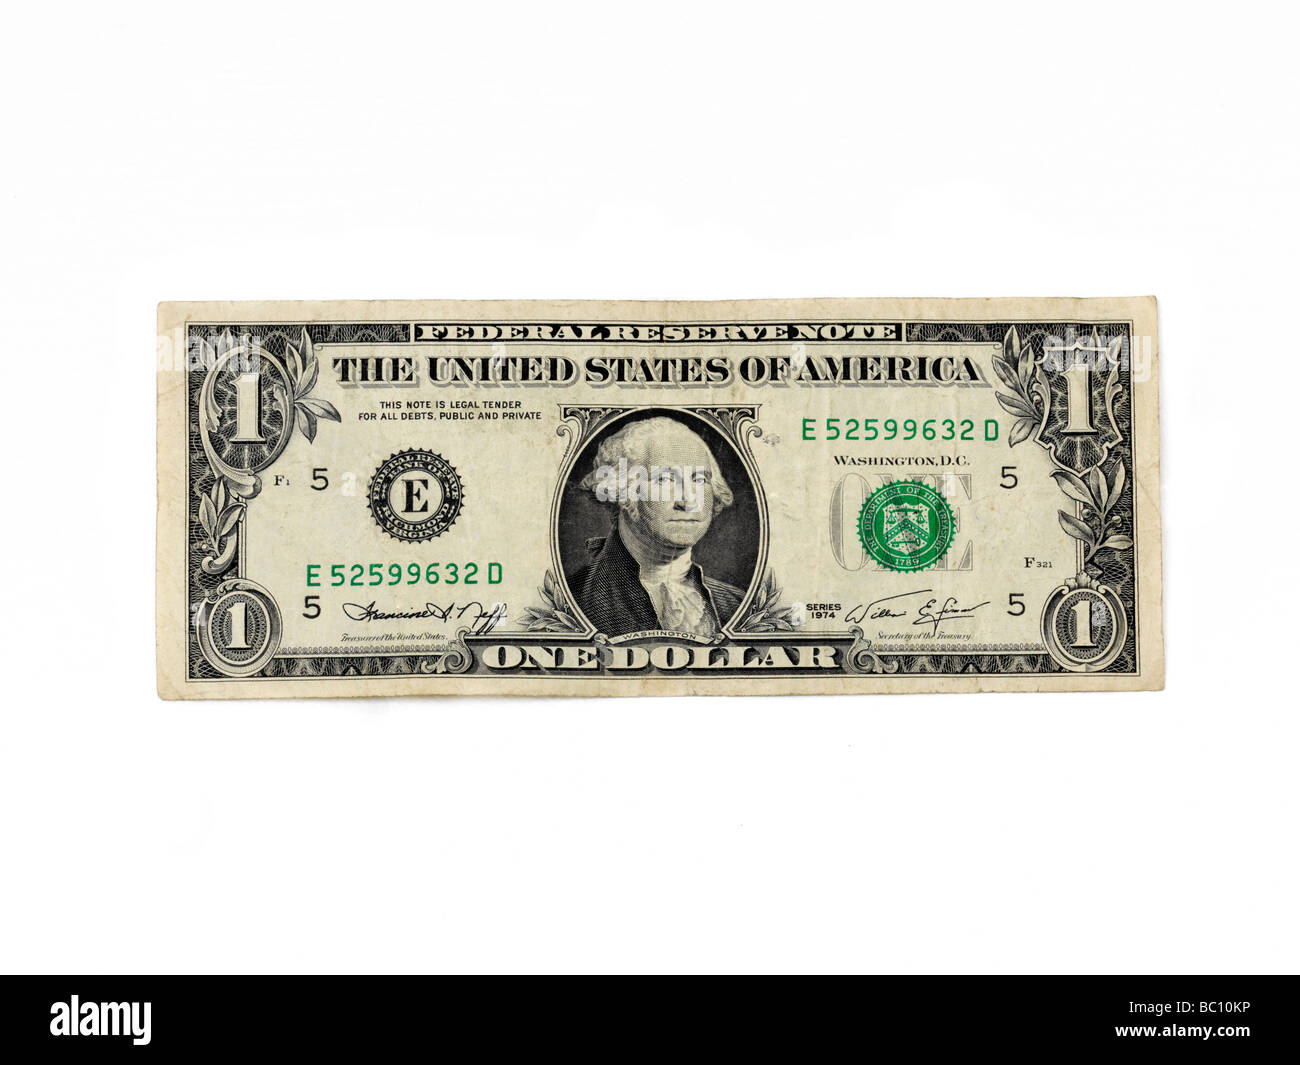 Dollar Bill Stock Photos & Dollar Bill Stock Images - Alamy